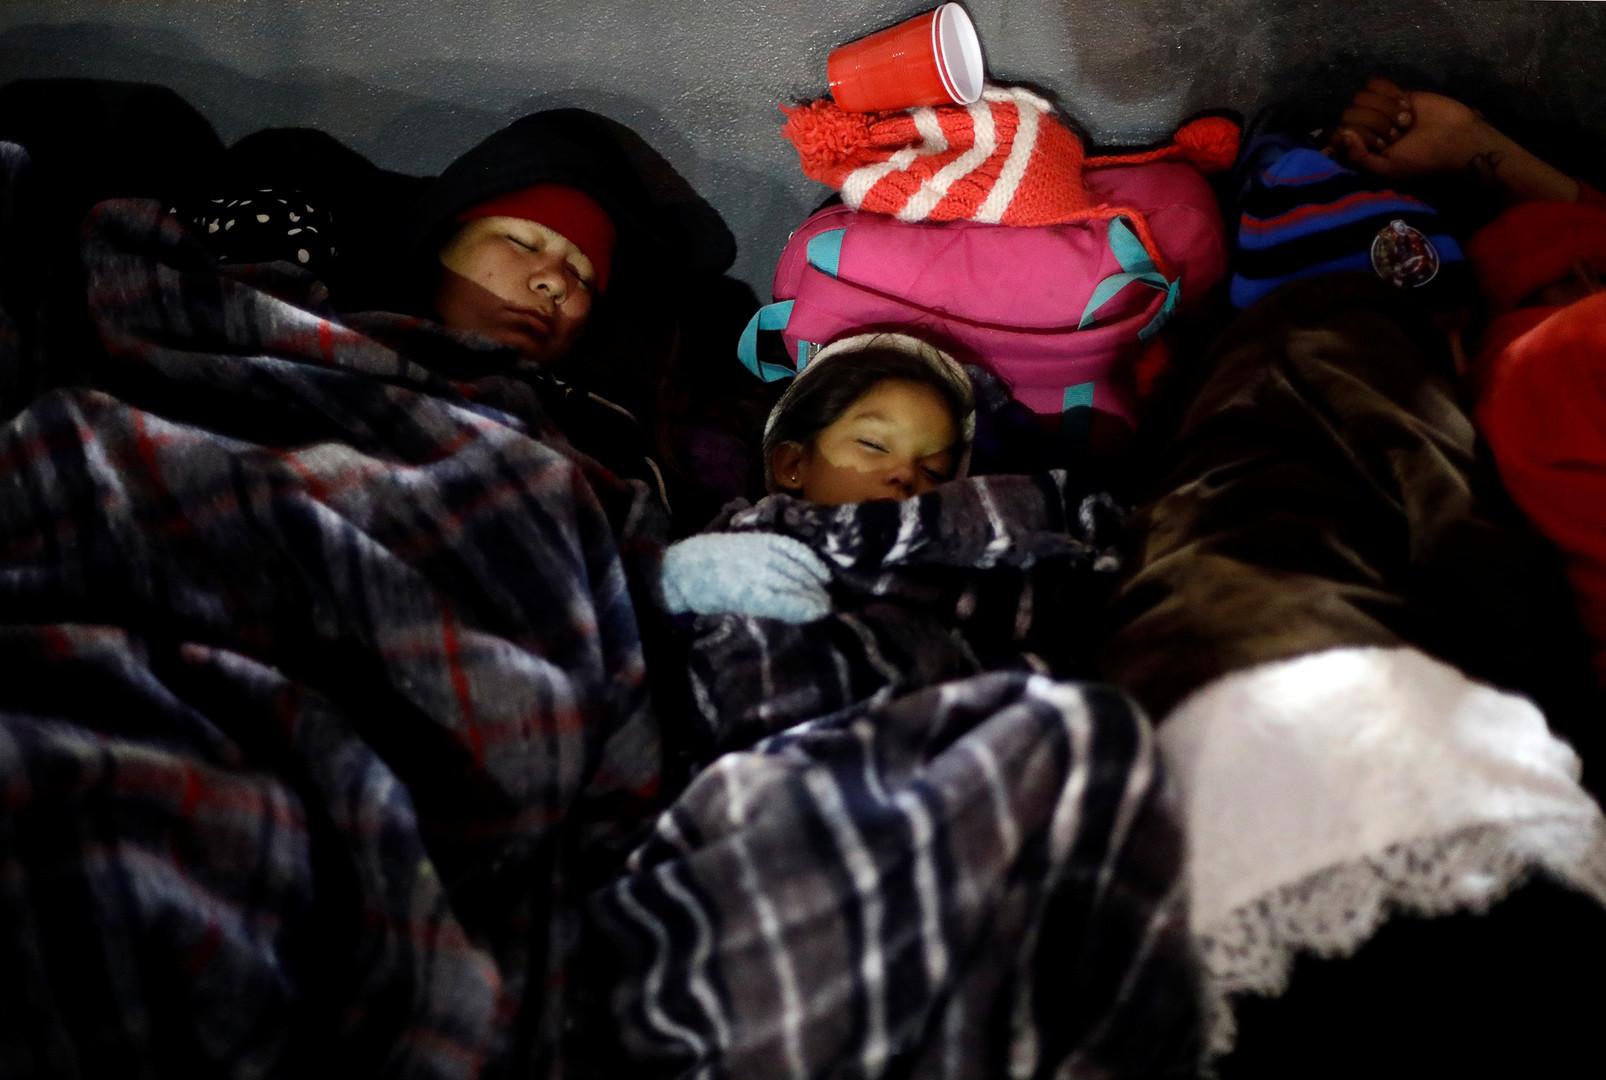 Teilnehmer an der Flüchtlings-Karawane schlafen nahe des Checkpoints San Isidro, Tijuana, Mexiko, 29. April 2018.